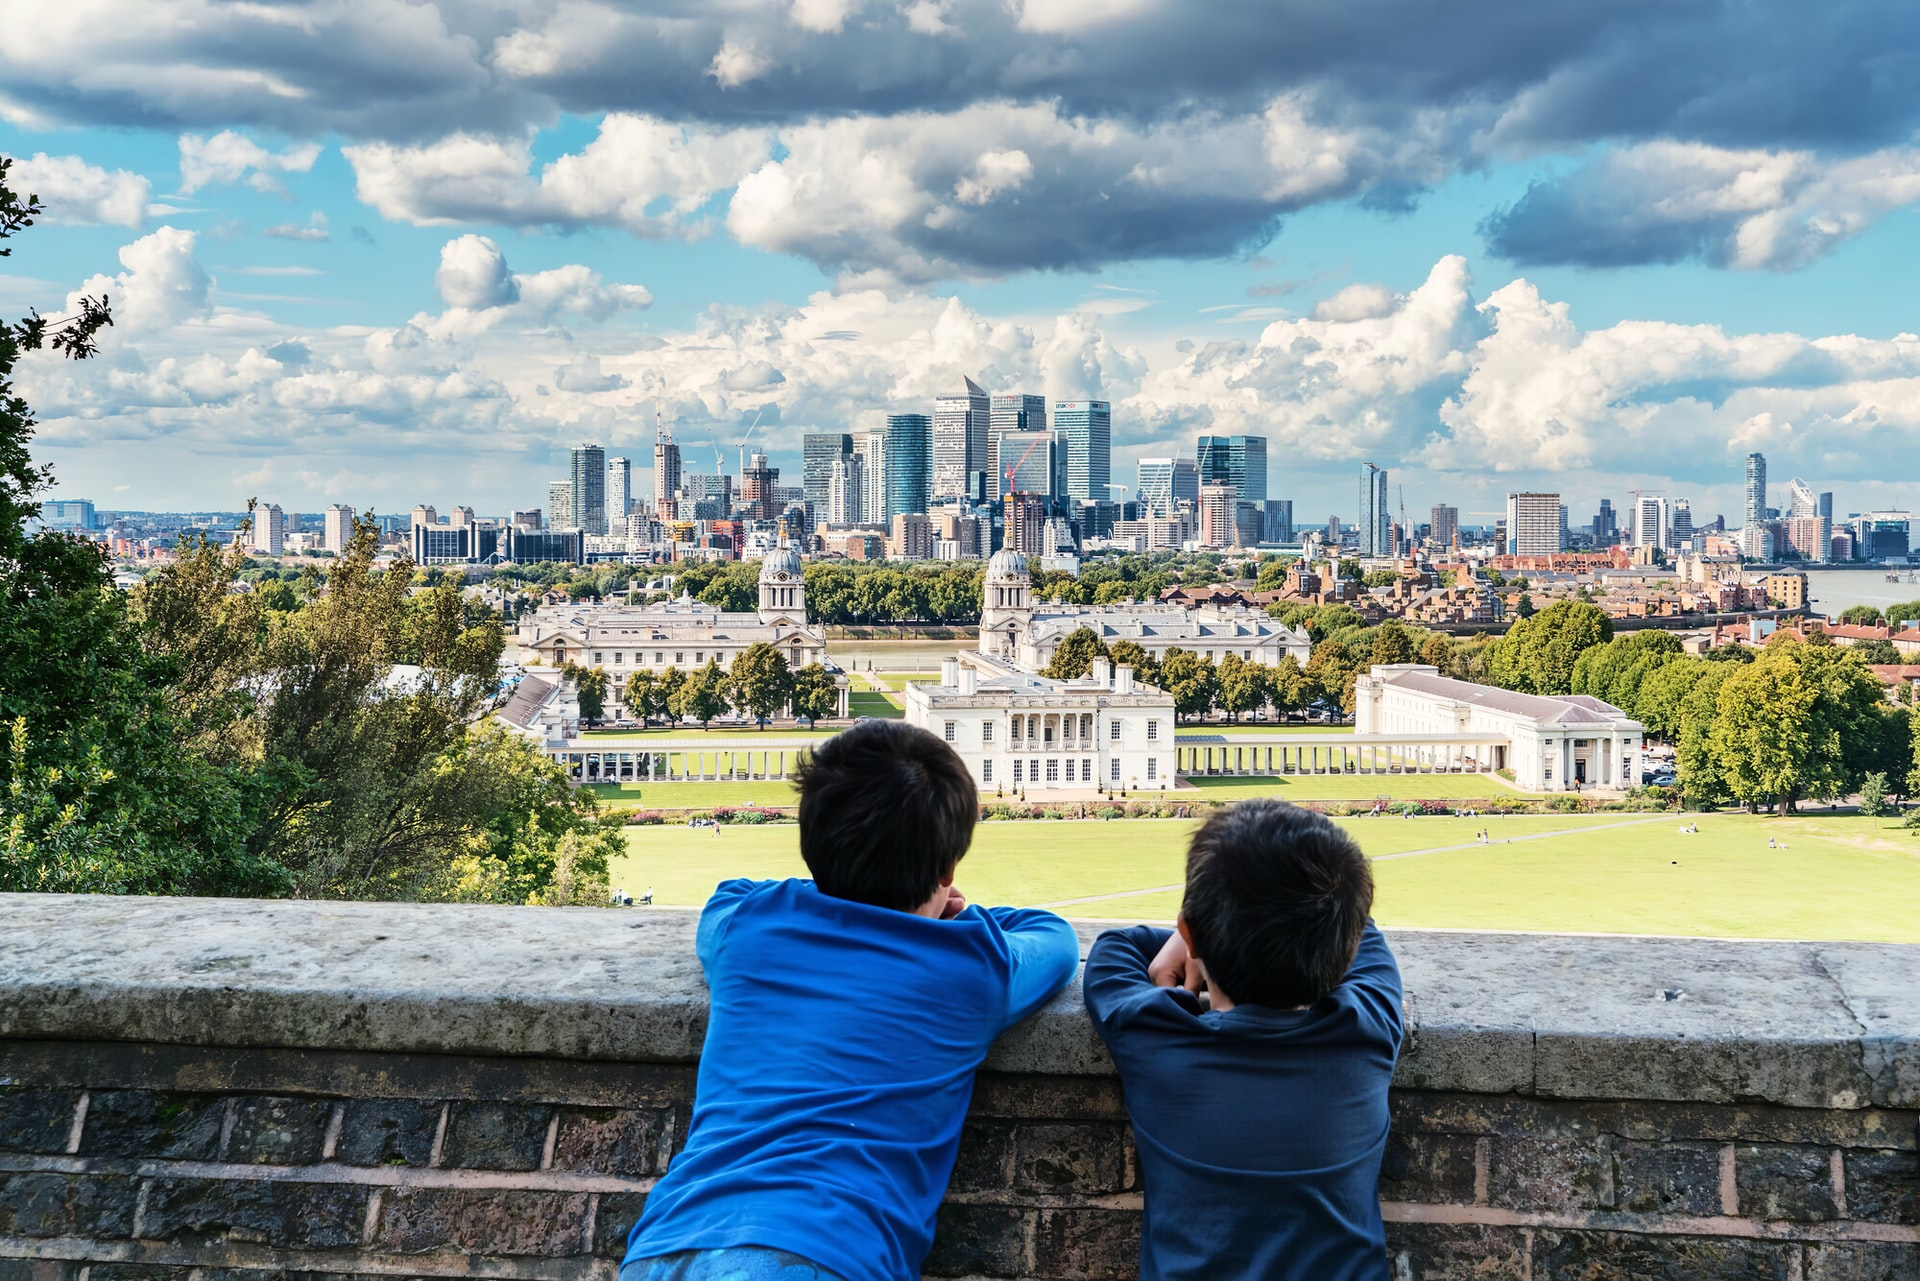 Kids looking at views of London